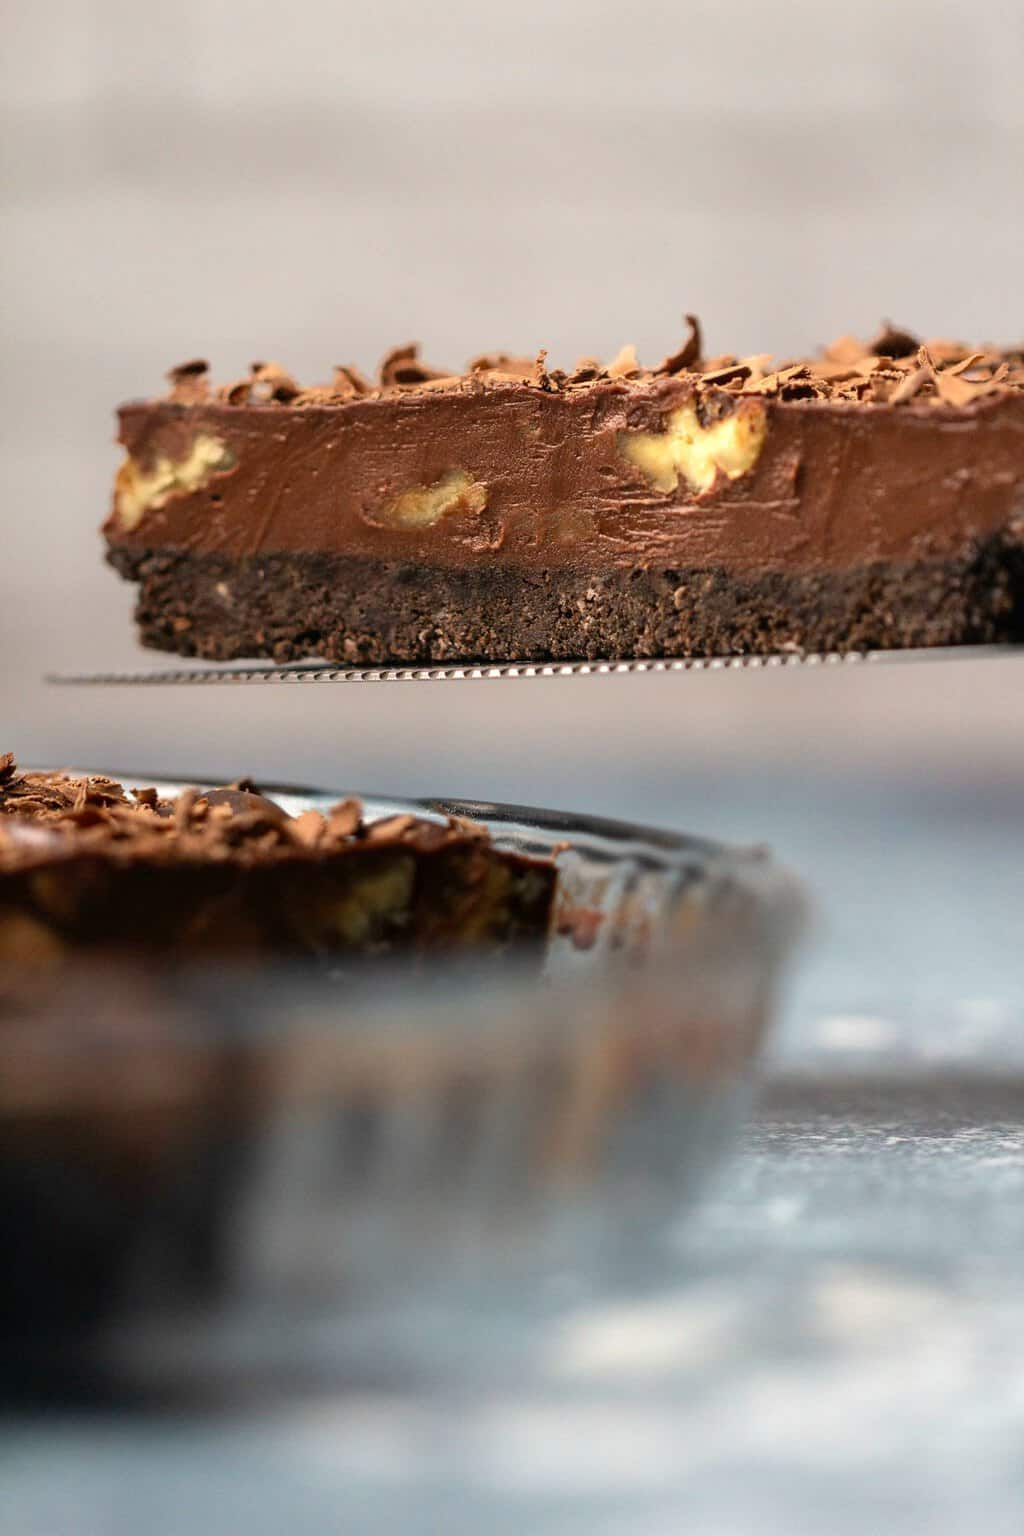 Slice of vegan chocolate tart on a cake lifter.